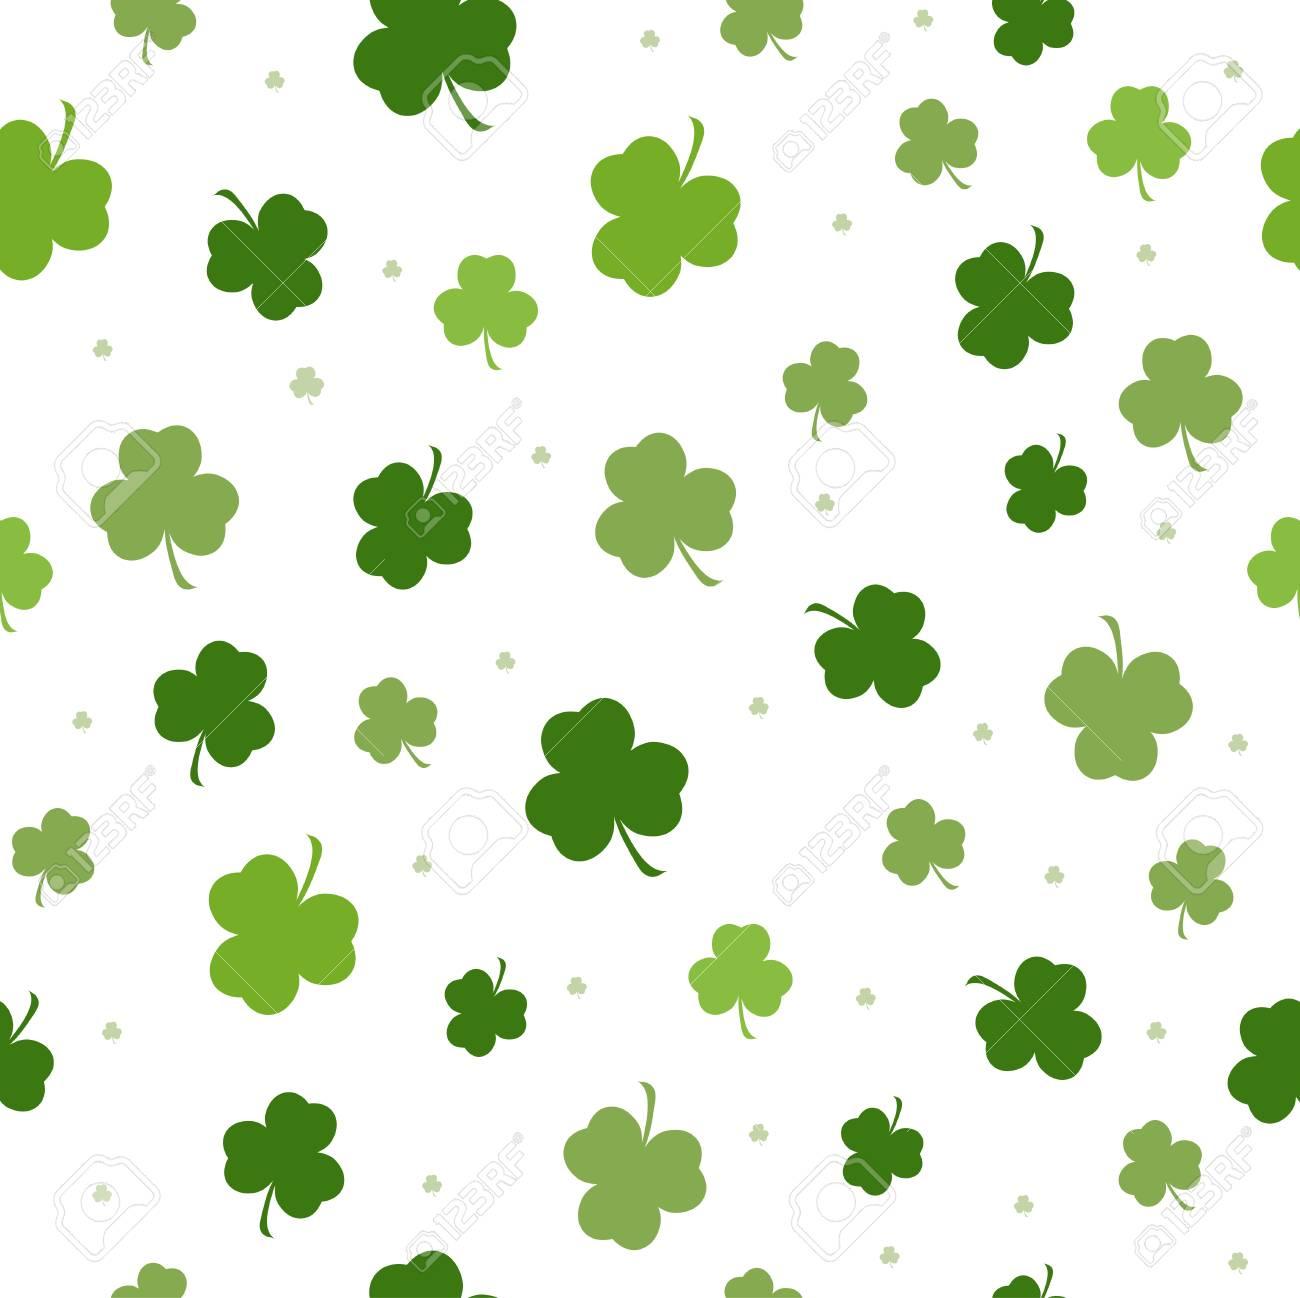 Set Of St Patricks Day Seamless Patterns With Polka Dot Argyle 1300x1298